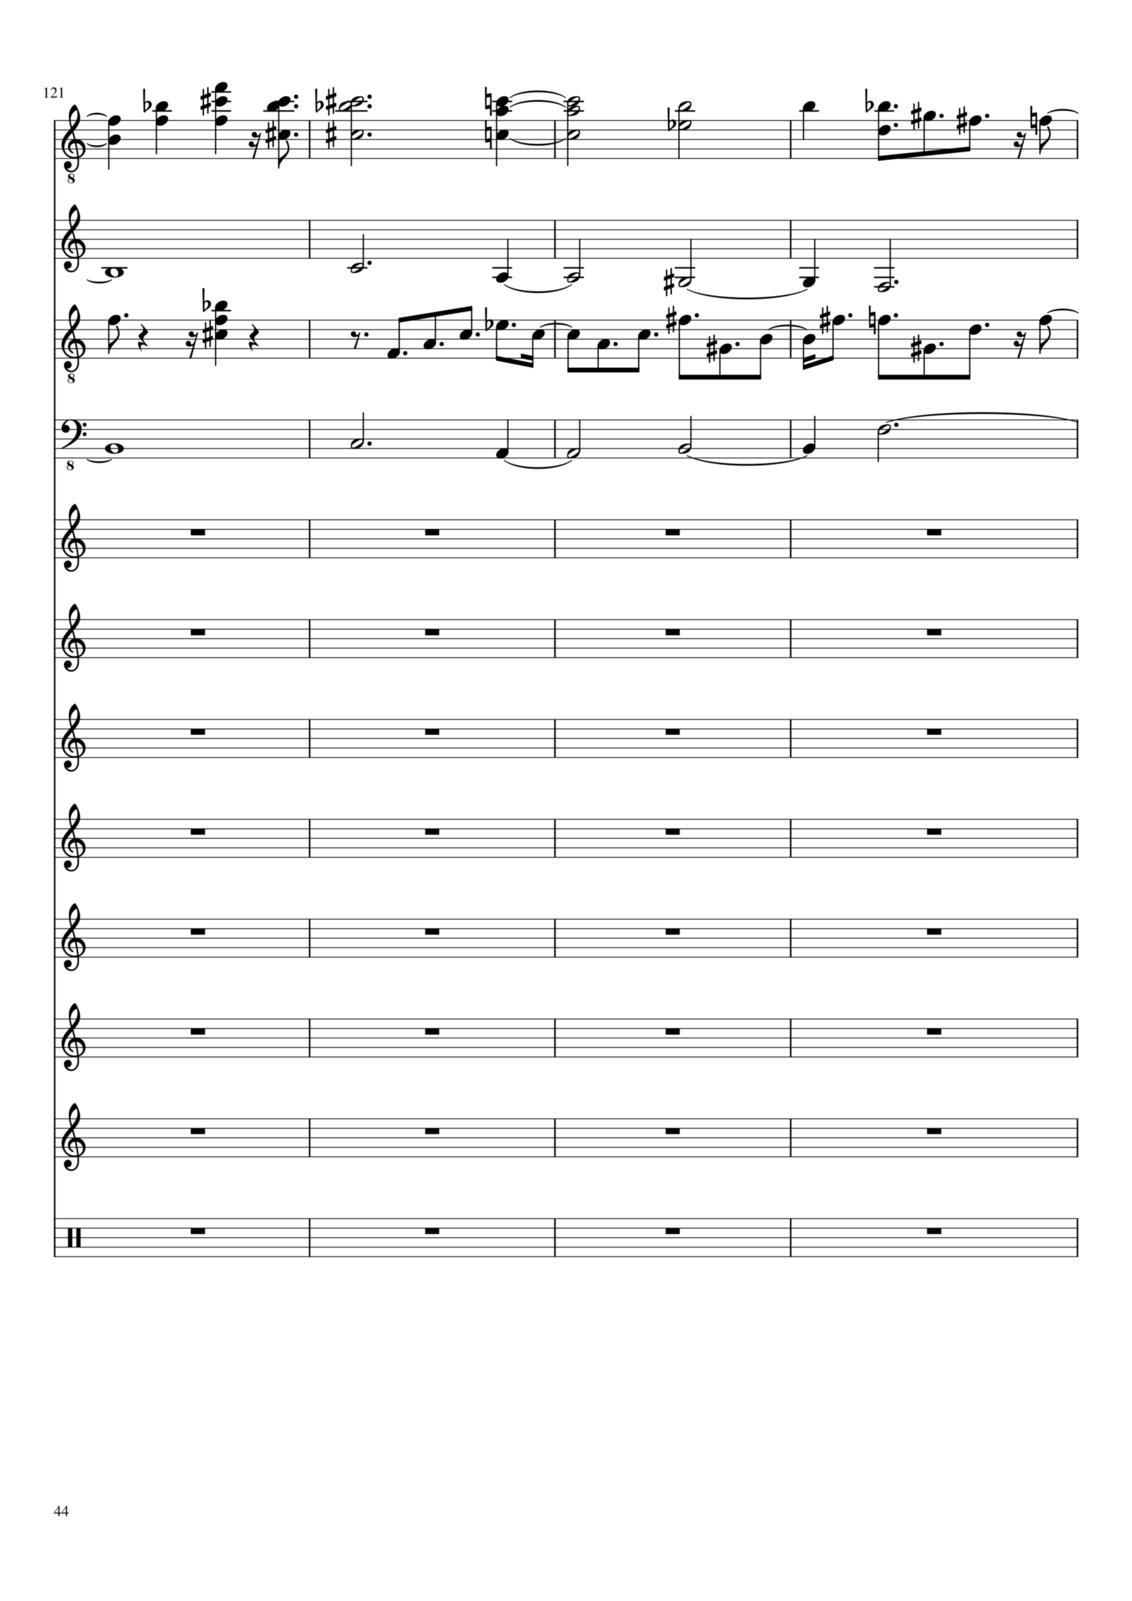 Prosti slide, Image 44